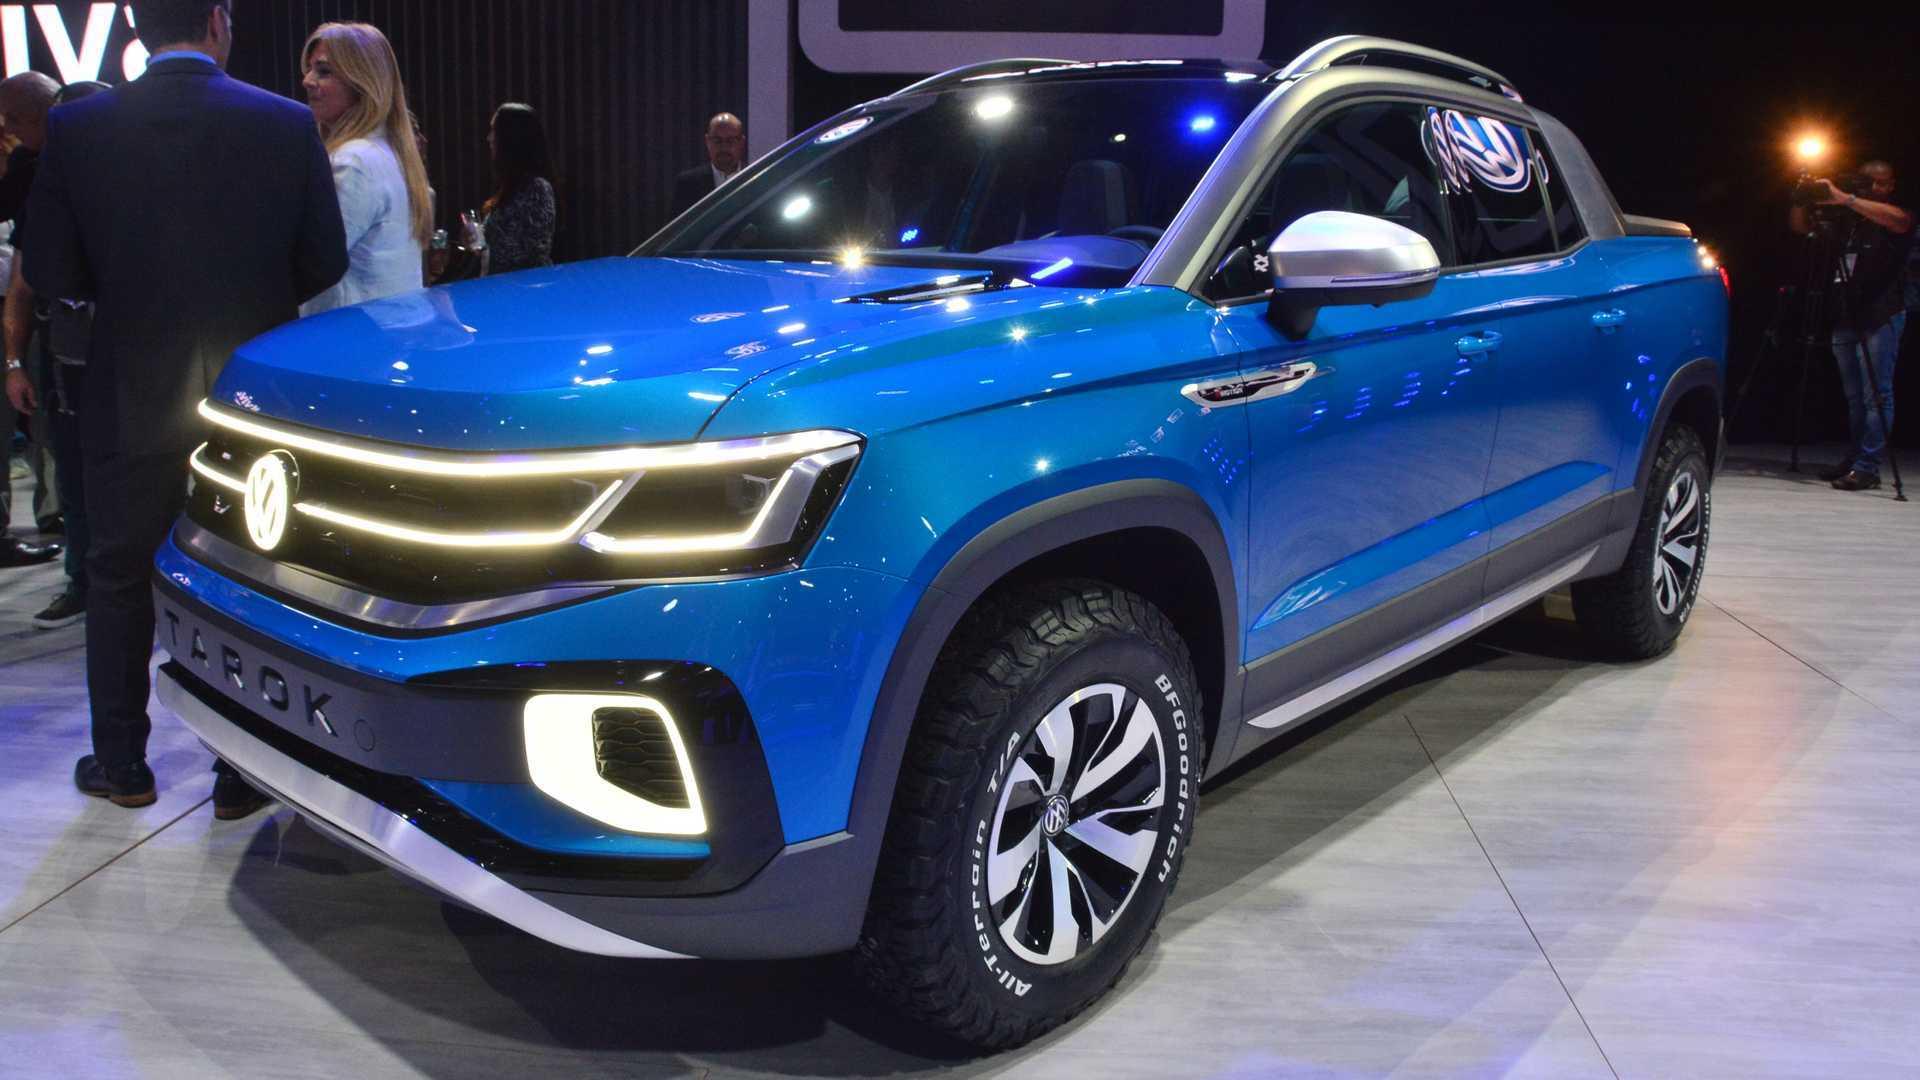 Forum gratis : Compra e venda engenharia Carro Volkswagen-tarok-concept-salao-de-sp-2018